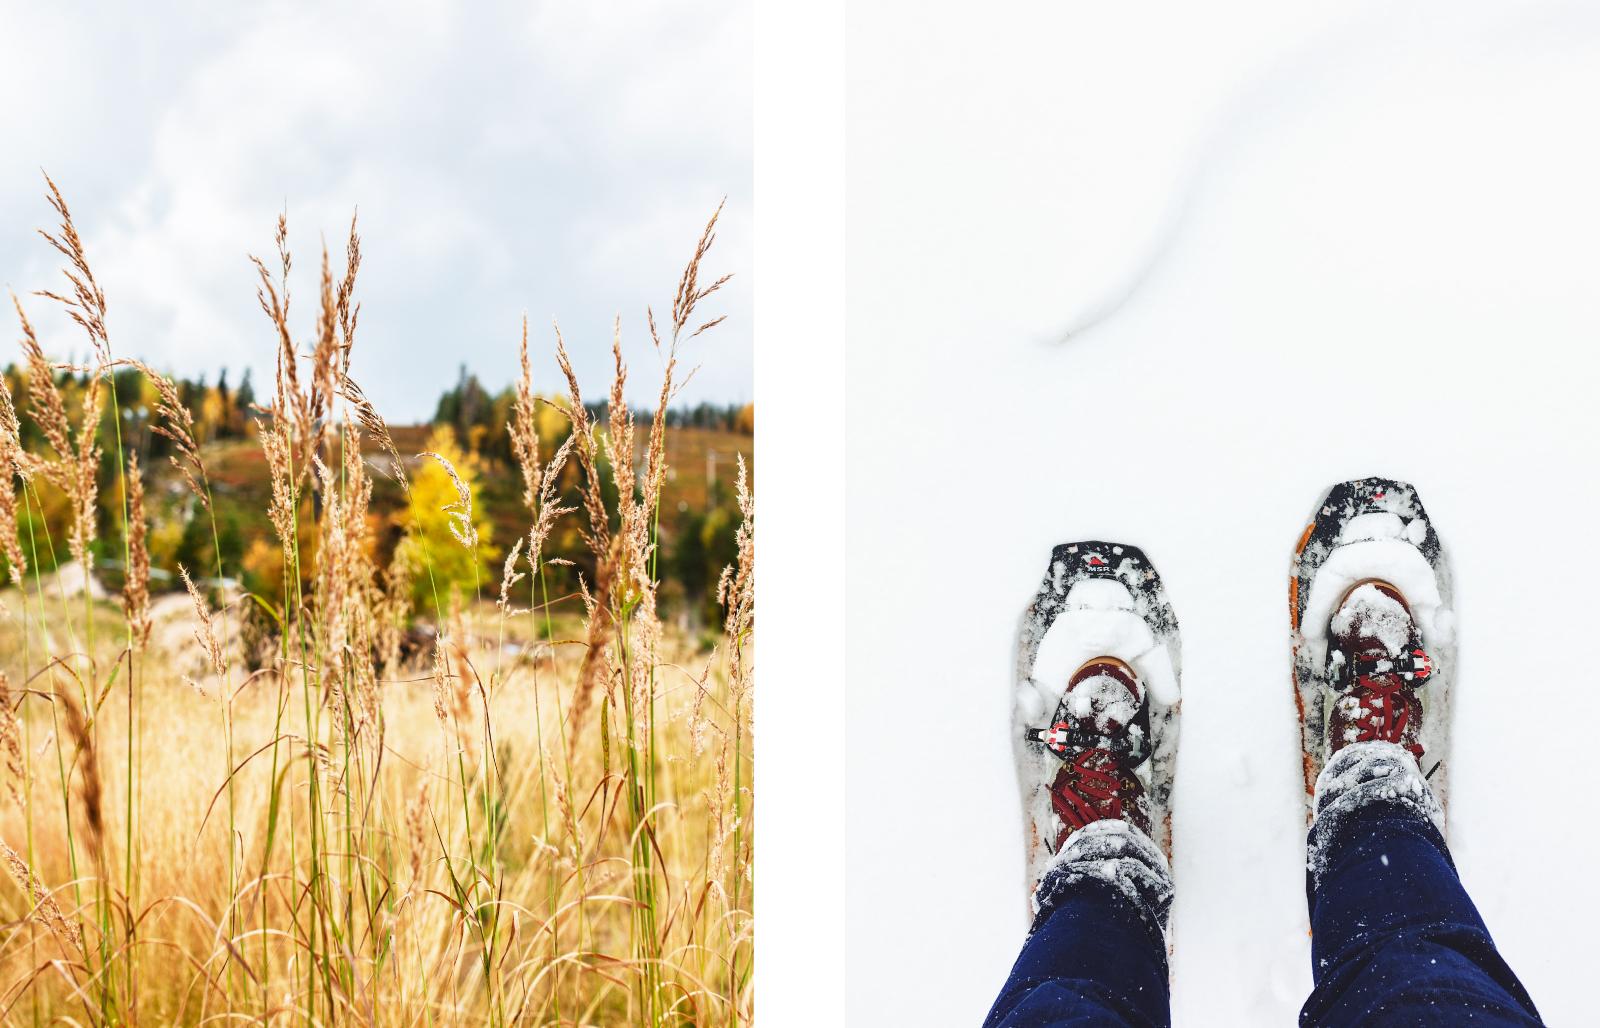 Krista_Karki_Portfolio_Suomu_Lapland-03.jpg